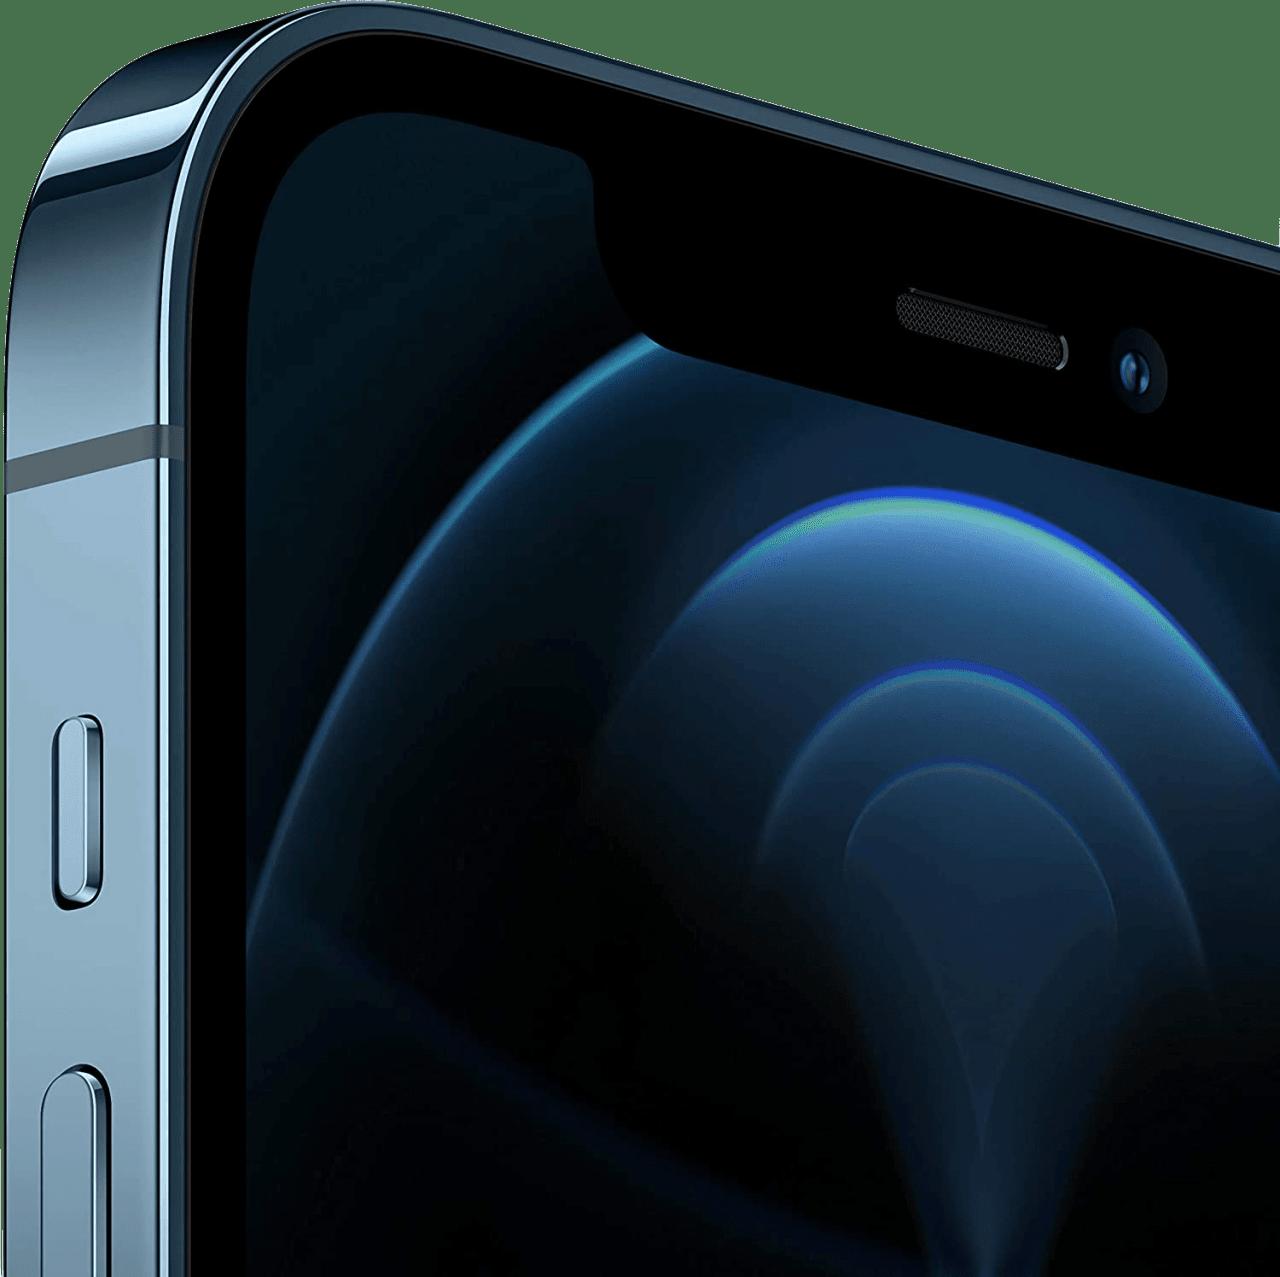 Pacific Blue Apple iPhone 12 Pro Max - 256GB - Dual Sim.3